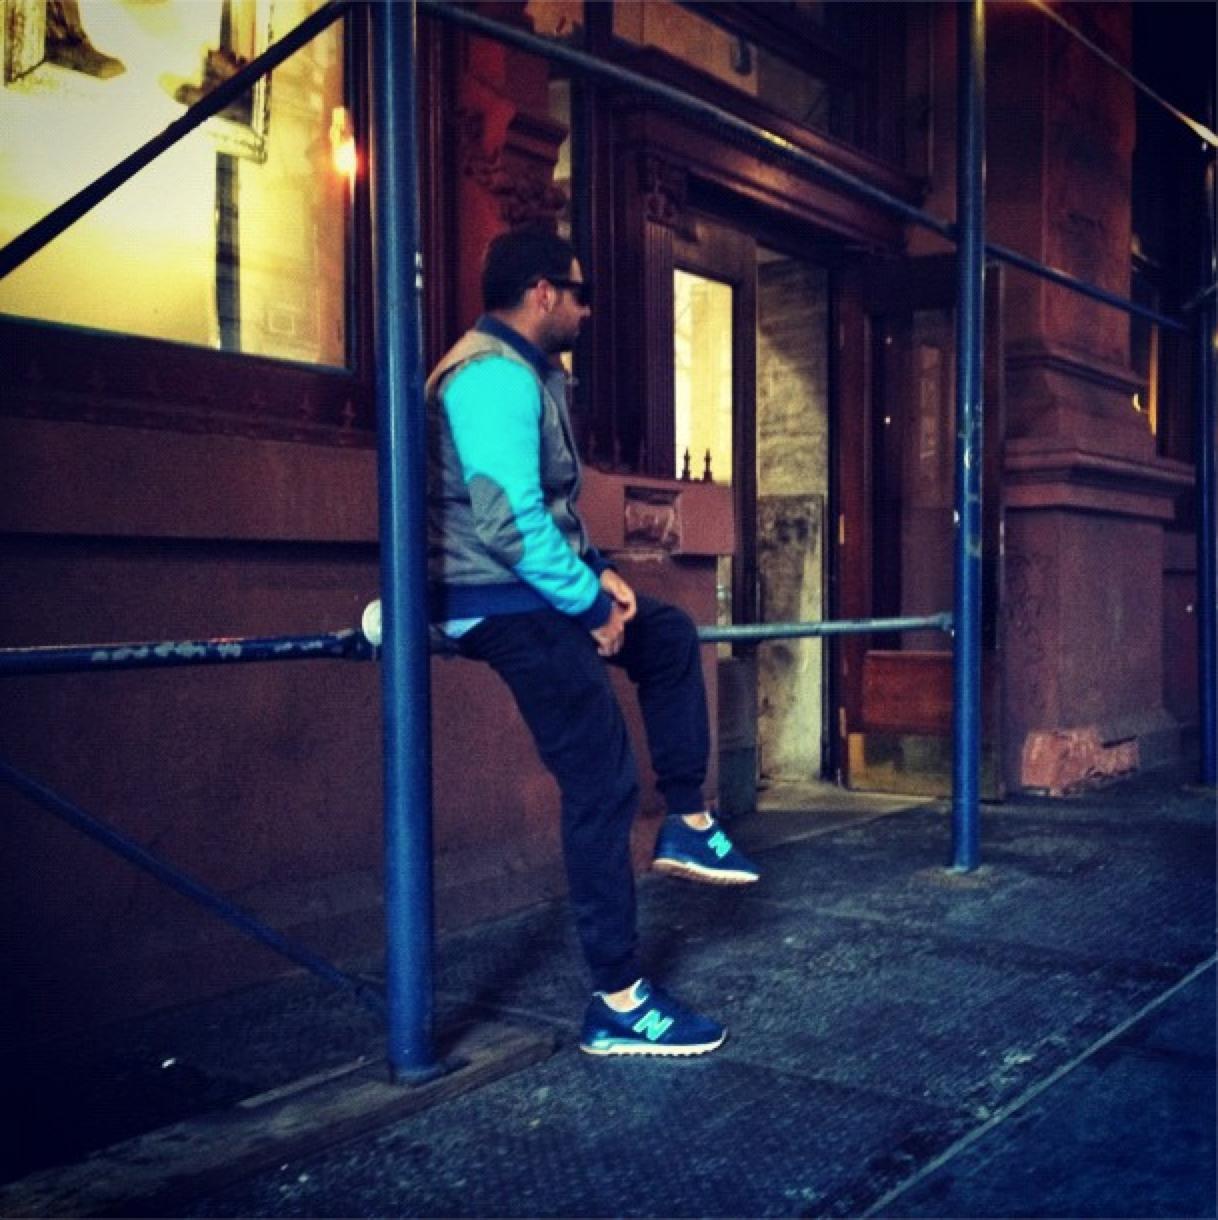 Ronnie Fieg x New Balance Fall 2012 Teaser